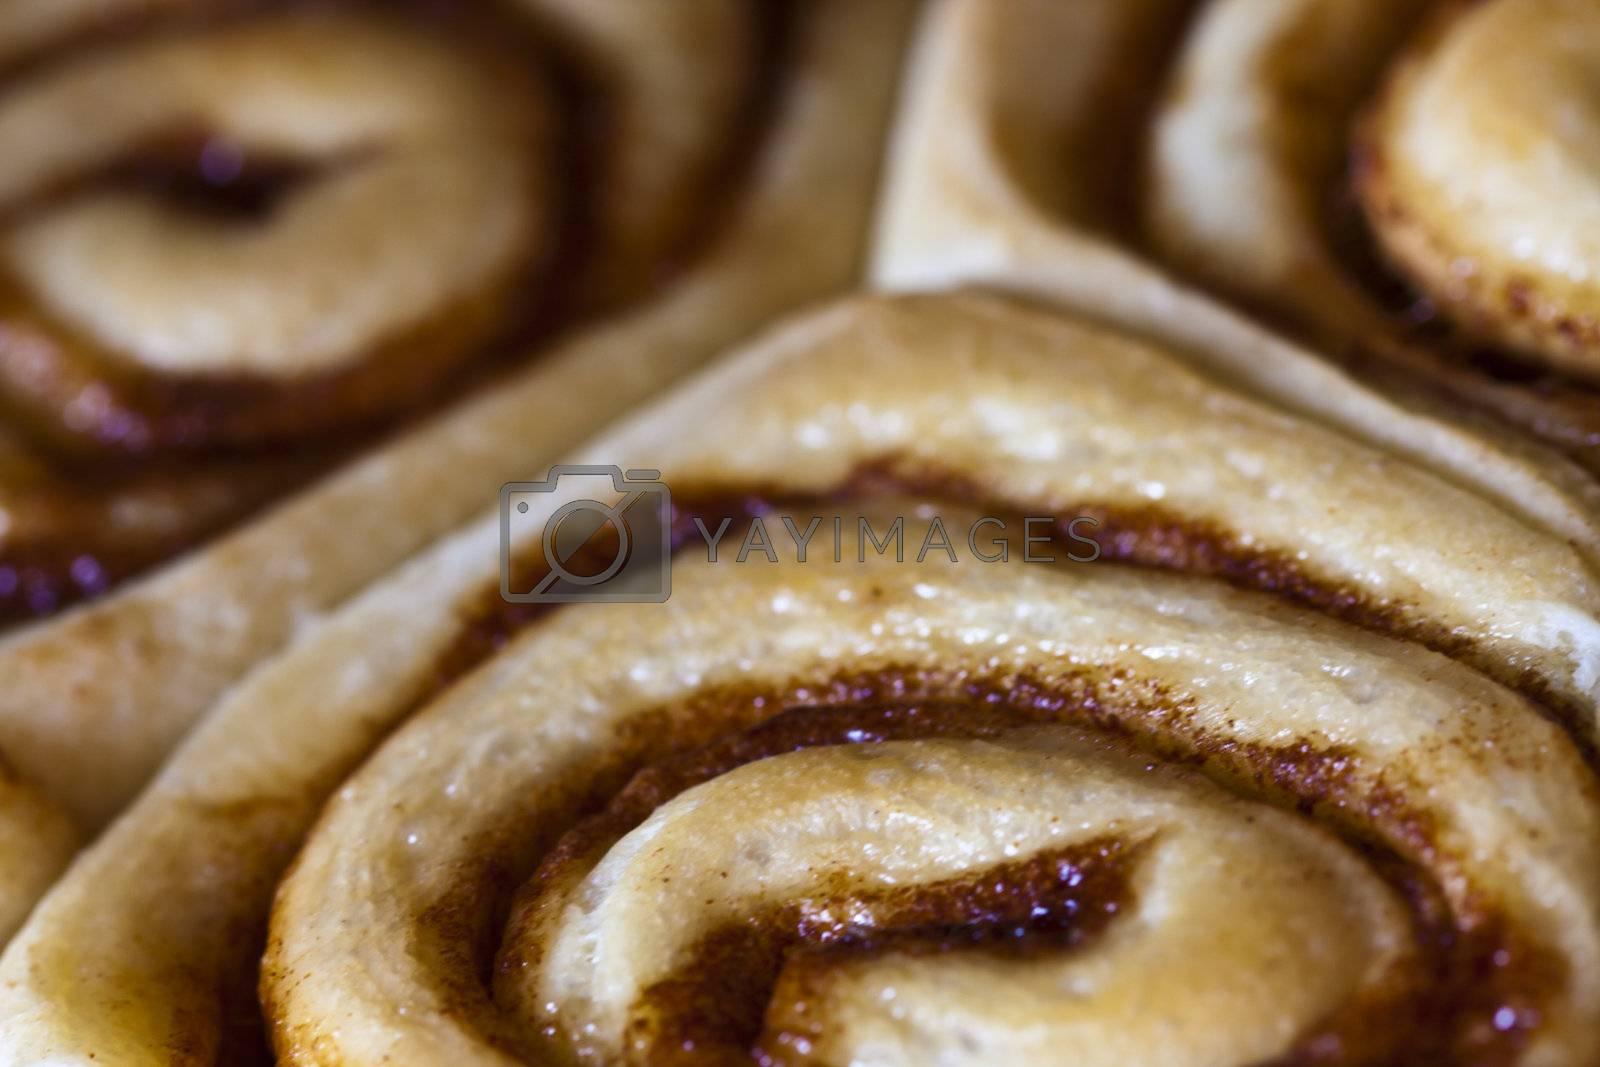 Royalty free image of cinnamon rolls by snokid